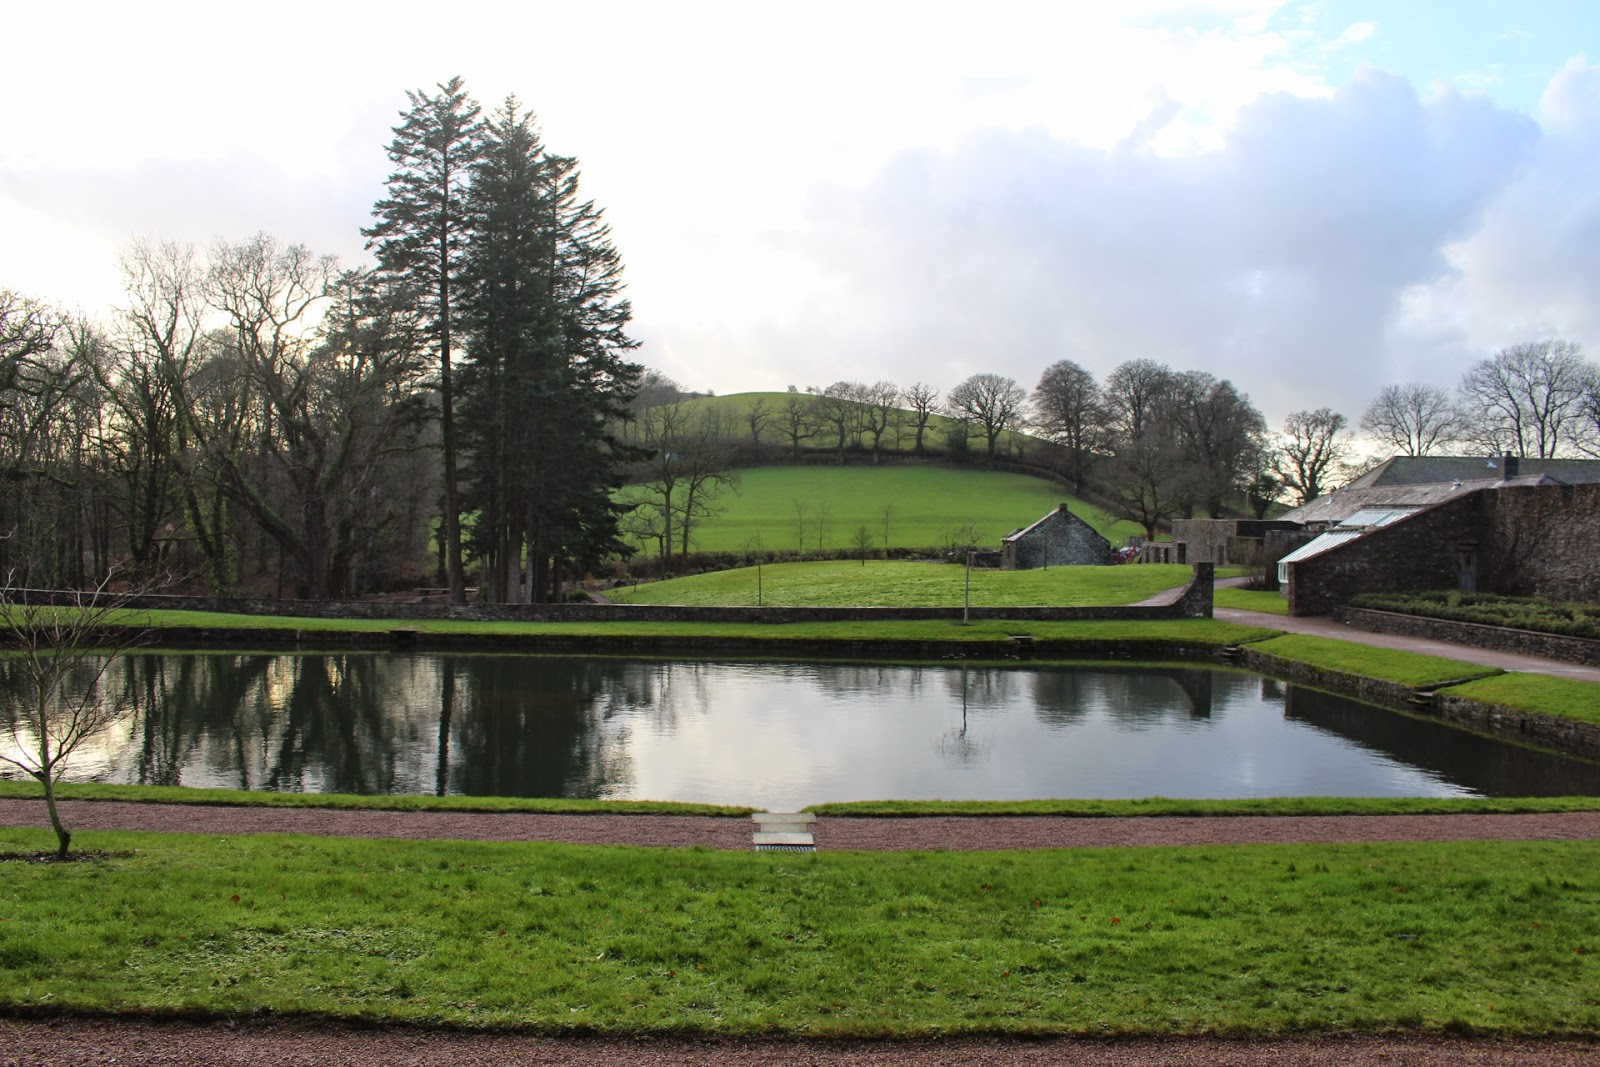 Photo showing the use of the landscape surrounding Aberglasney garden